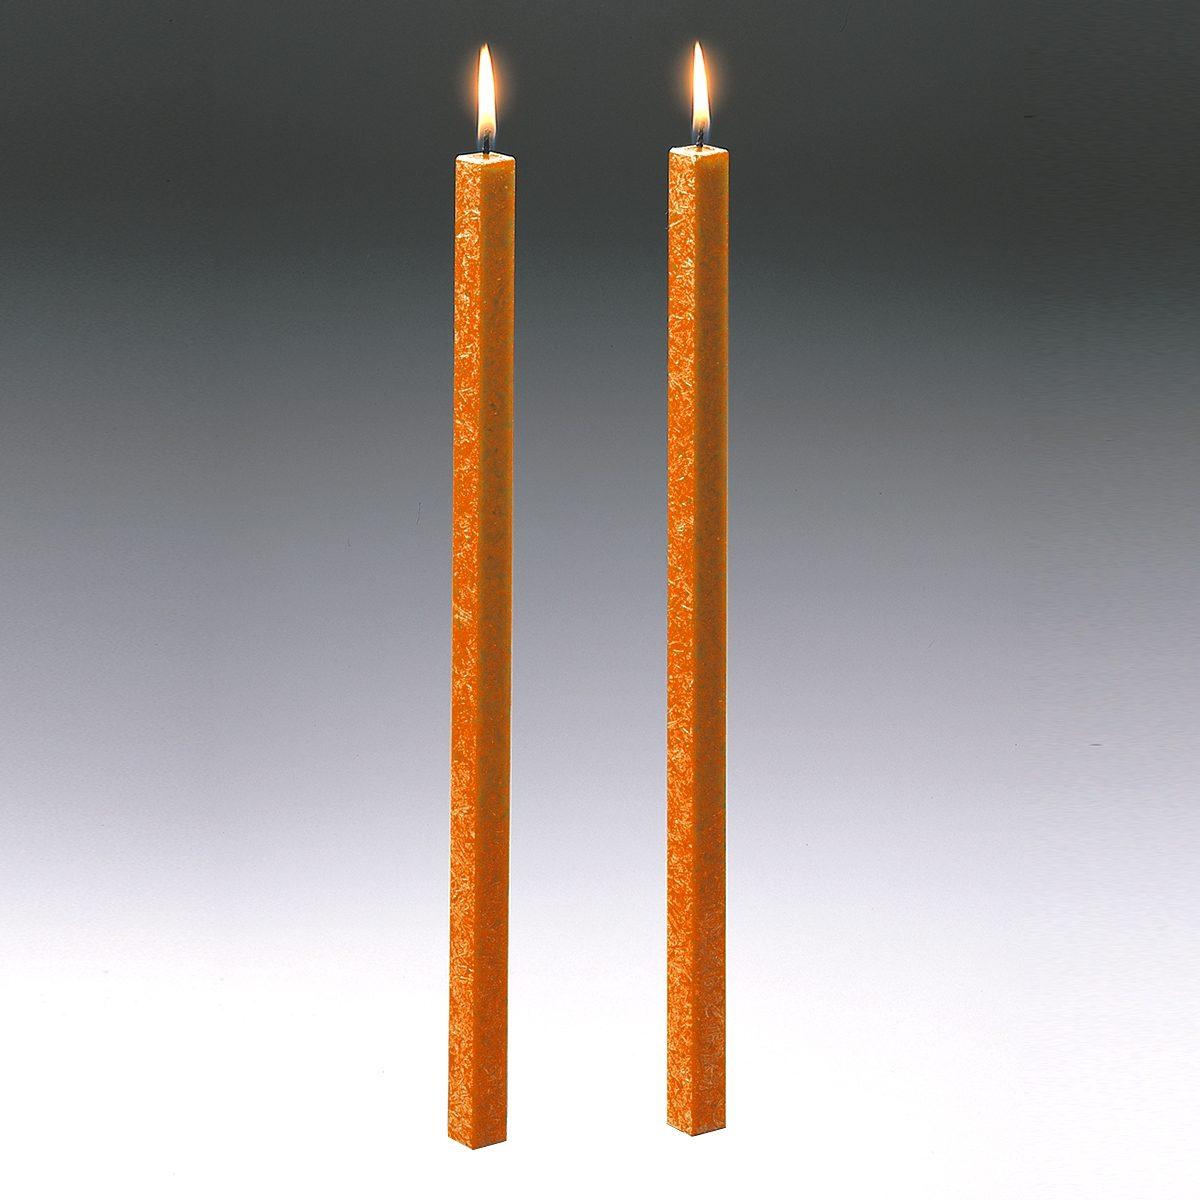 Amabiente Amabiente Kerze CLASSIC orange 40cm - 2er Set